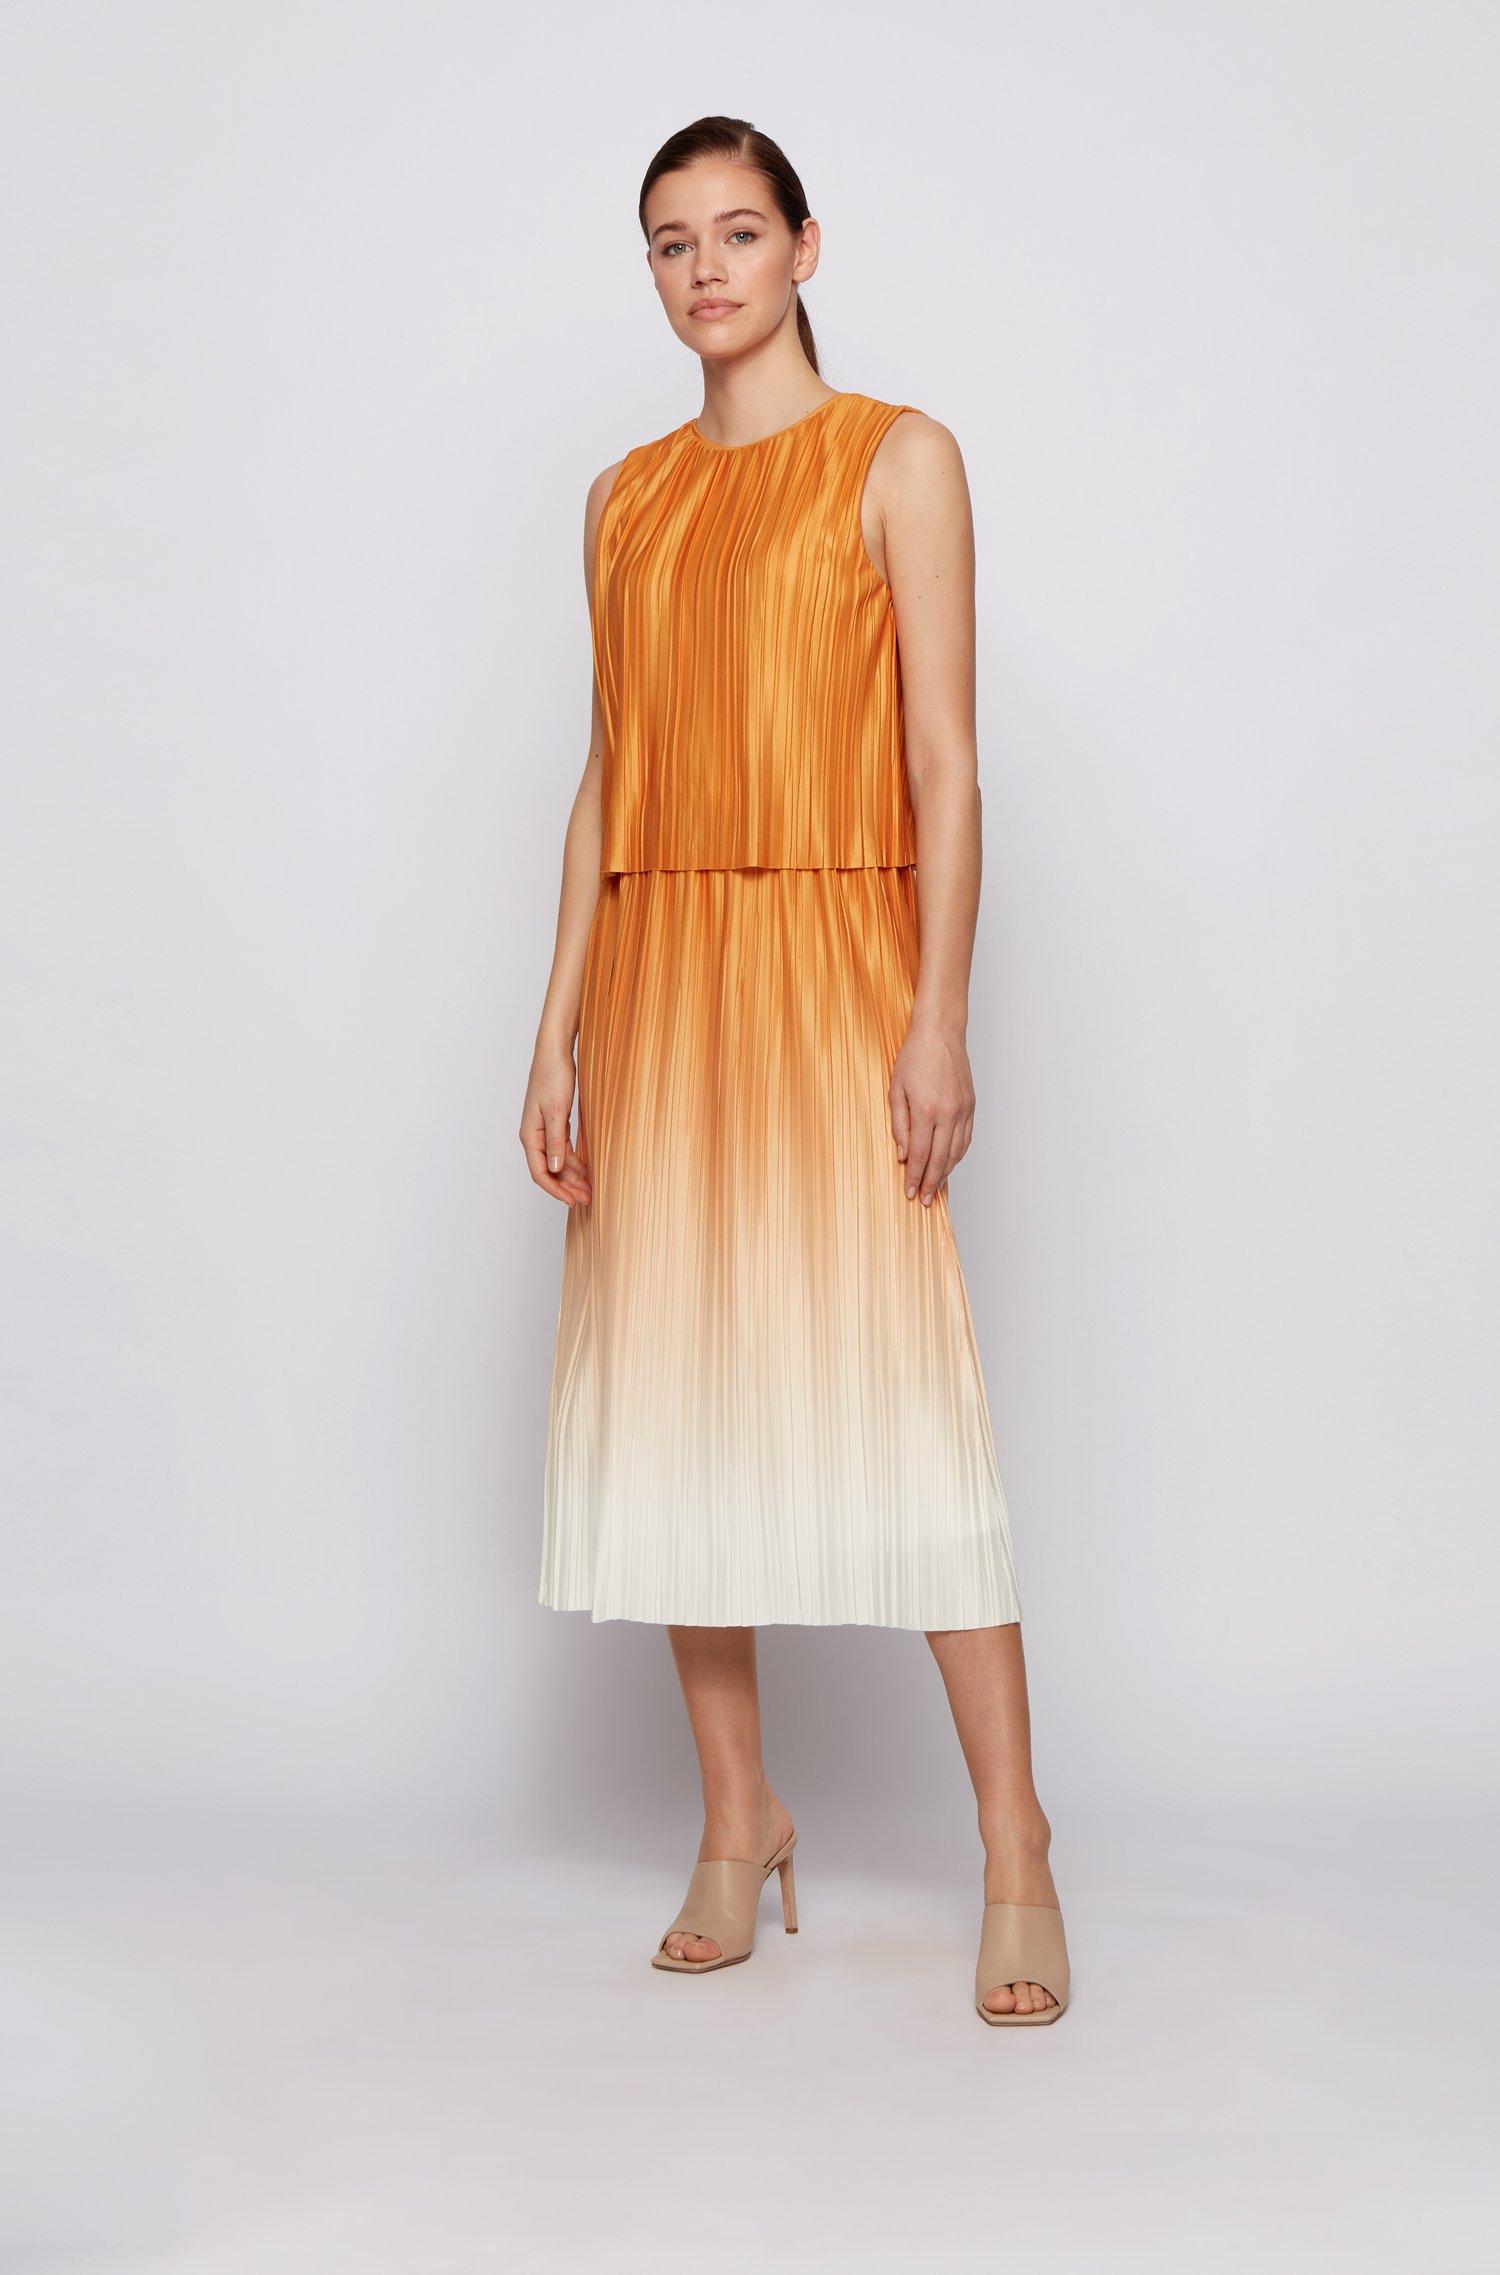 Layered degradé dress in Italian plissé fabric, Patterned